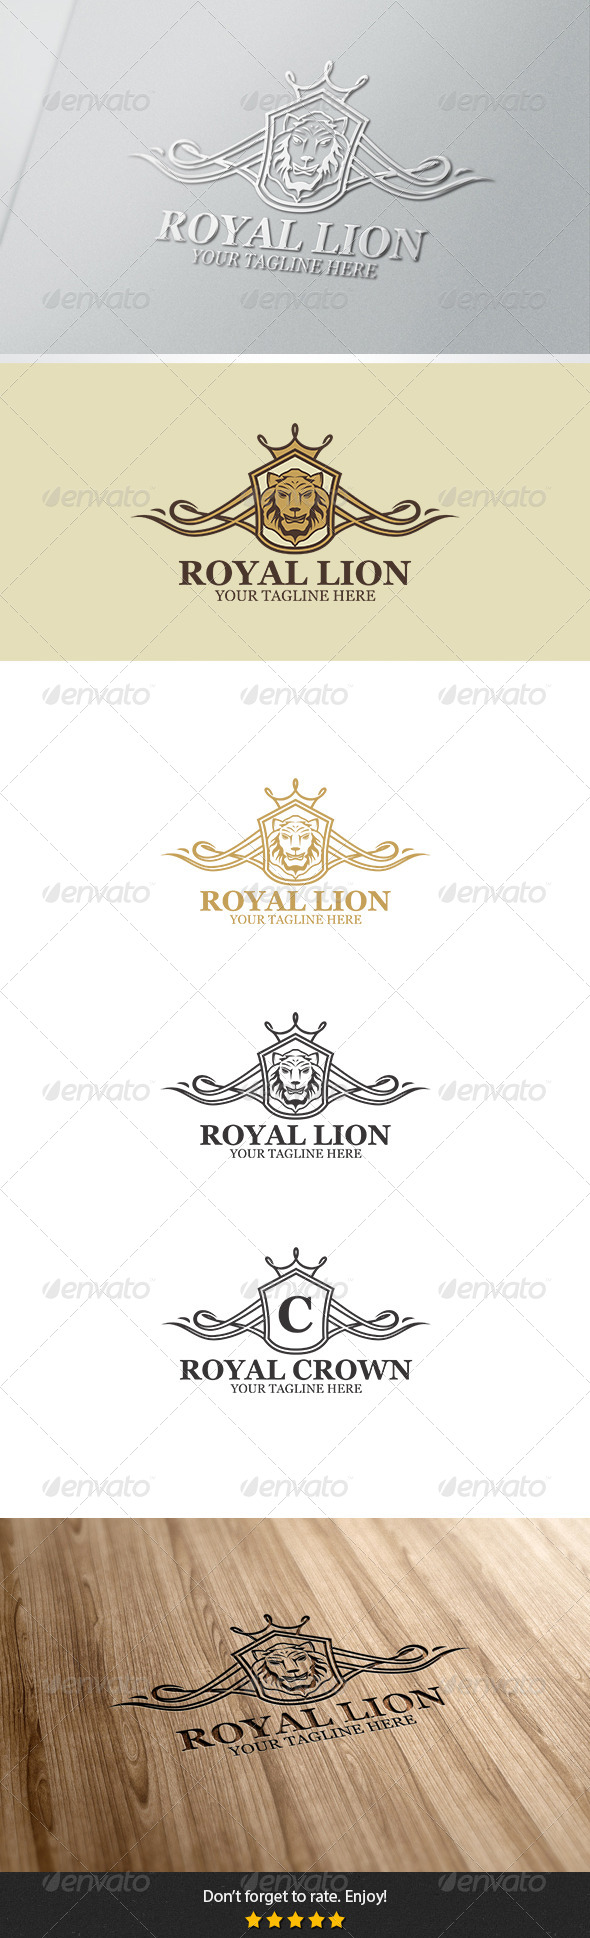 GraphicRiver Royal Lion Logo 5788402